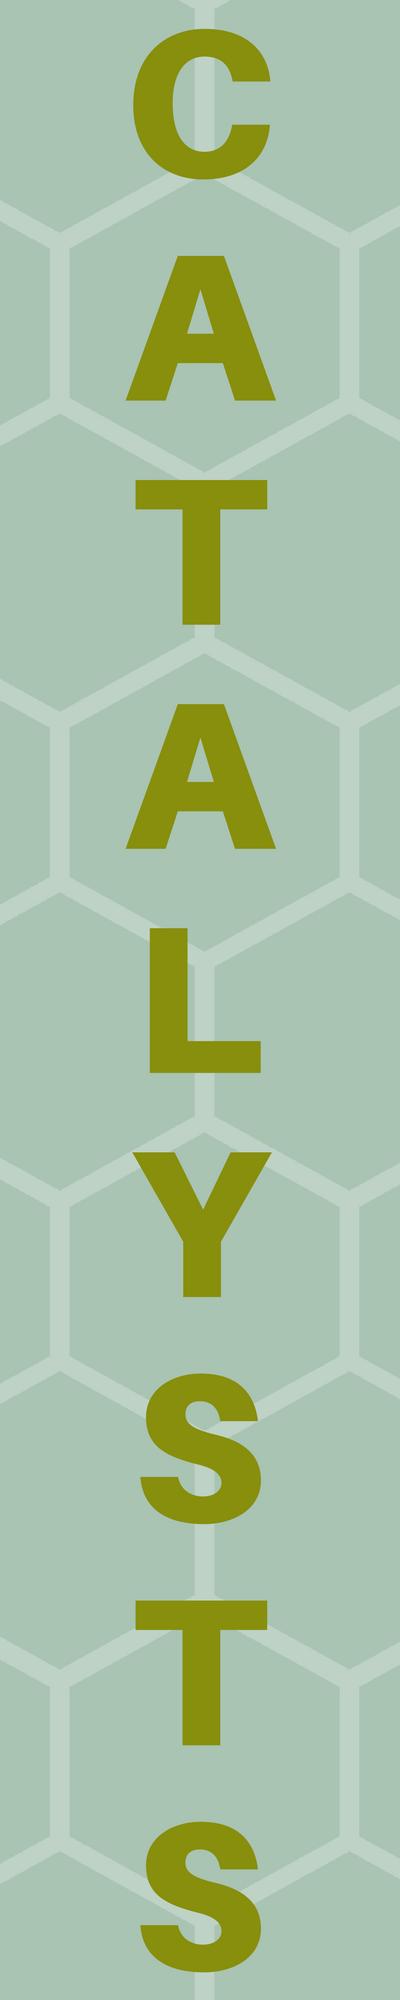 catalysts-2